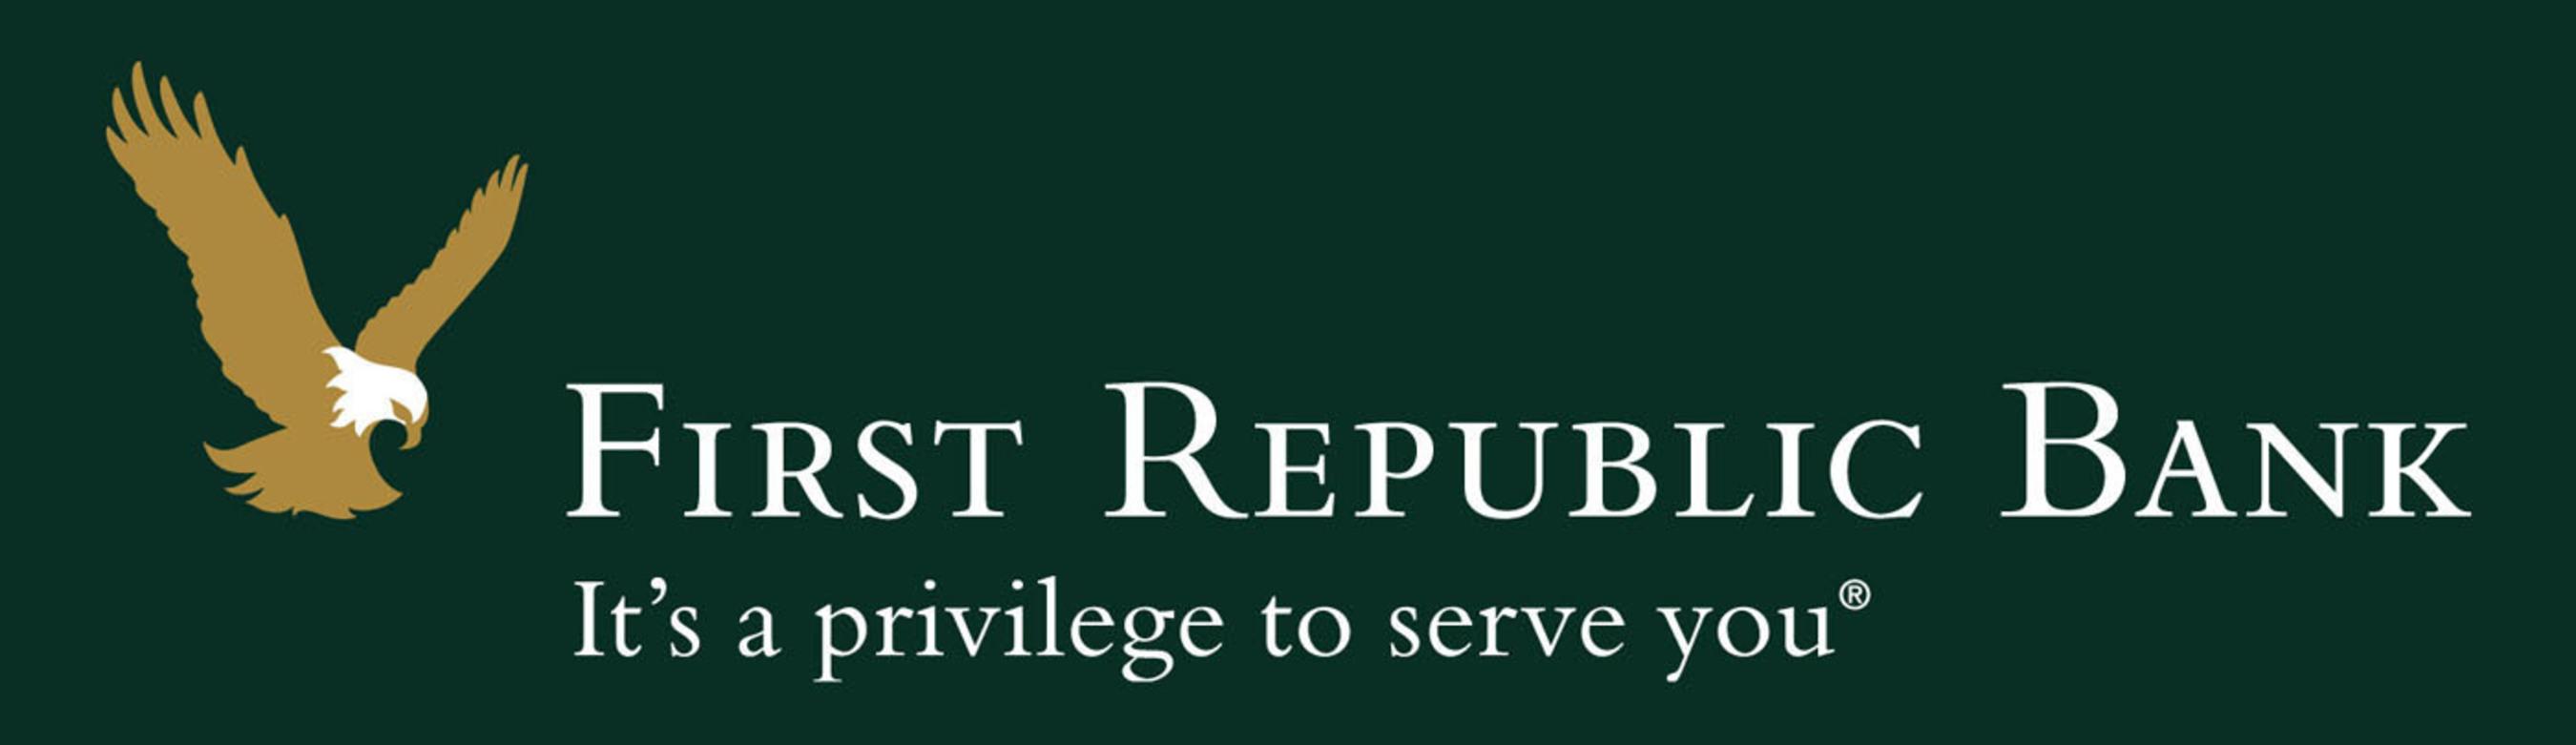 First Republic Bank's logo.